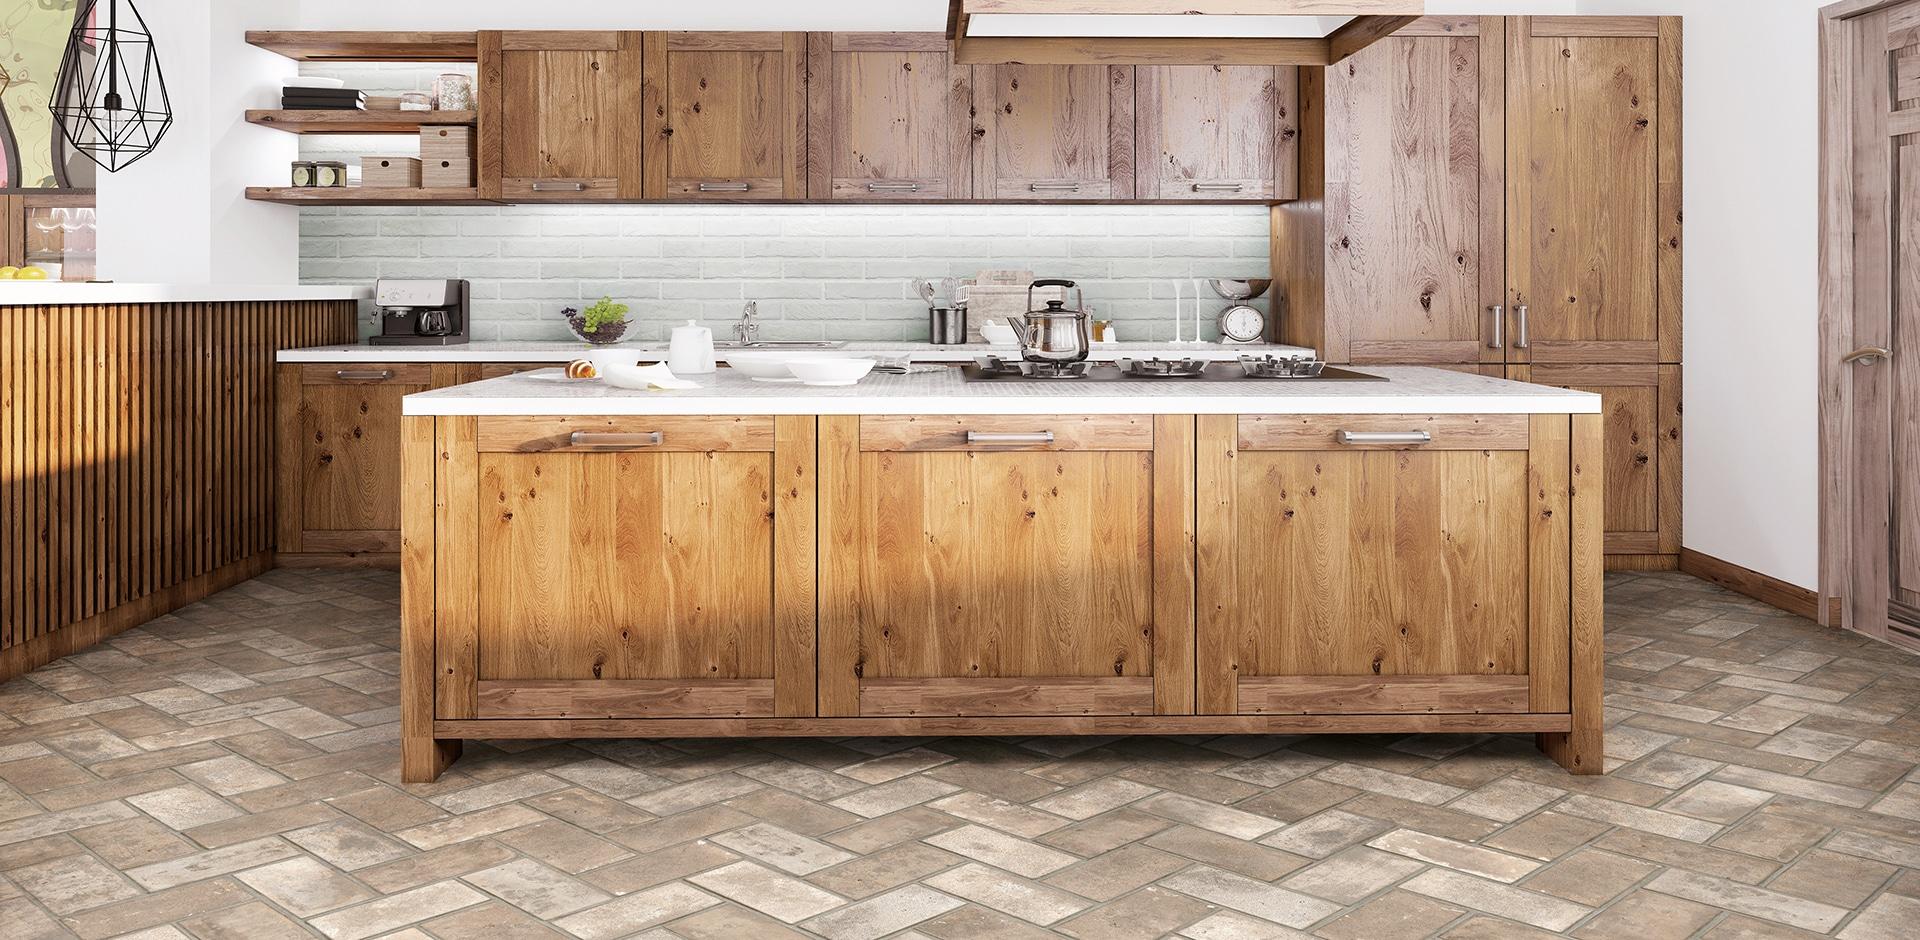 brown cabinets on ivory brick flooring